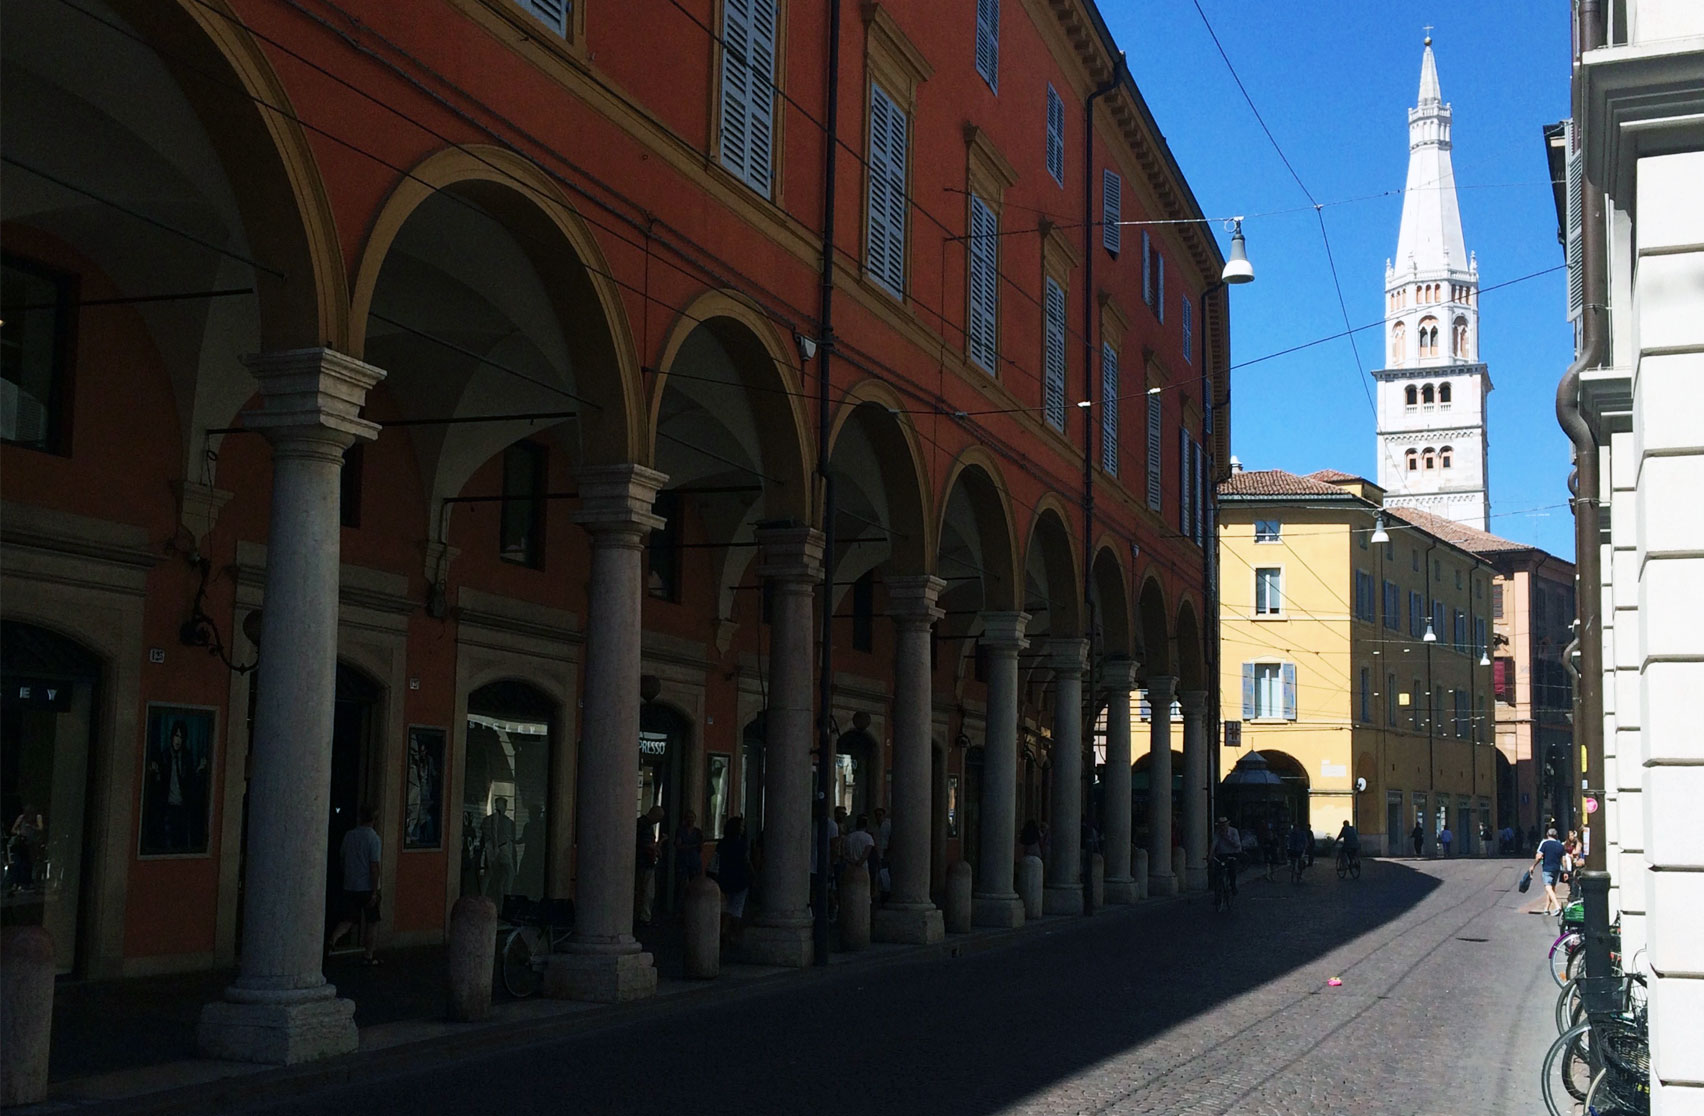 Weekend_Modena_48ore_per_godersi_il_centro_citta_ViaEmiliaCentro_MyModenaDiary_StefaniaFregni